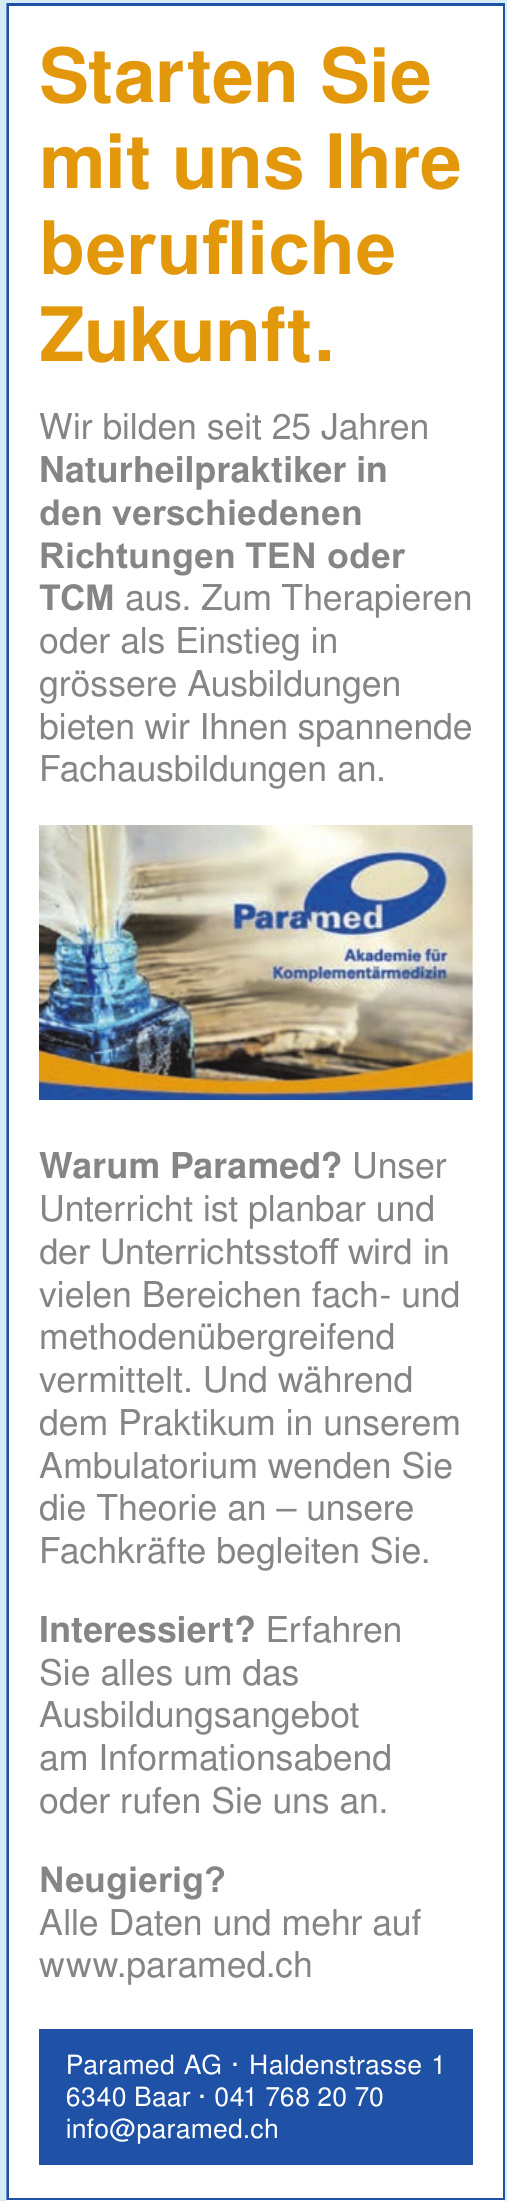 Paramed Akademie AG